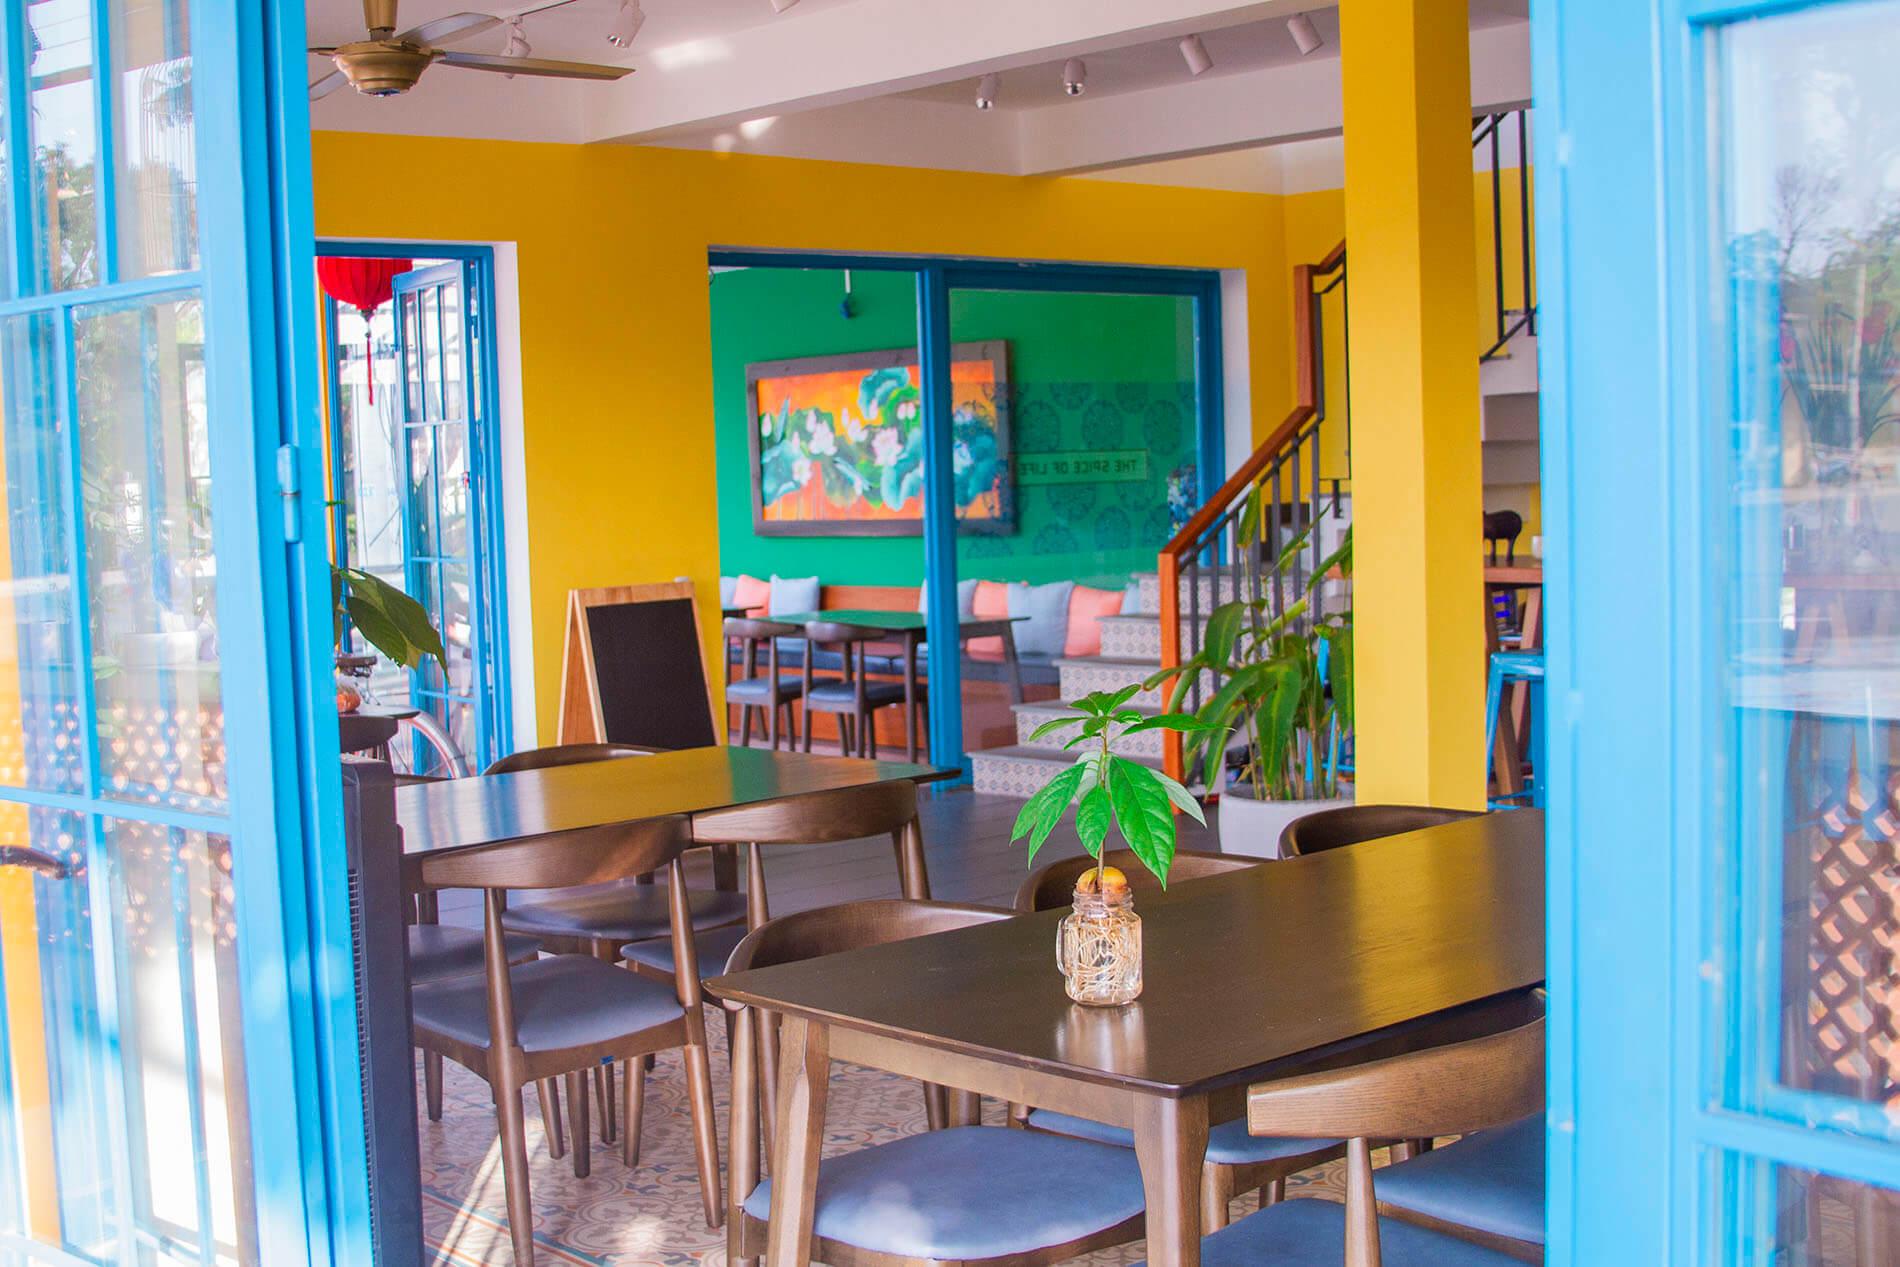 Cozy setup at Ixora Cafe & Dining